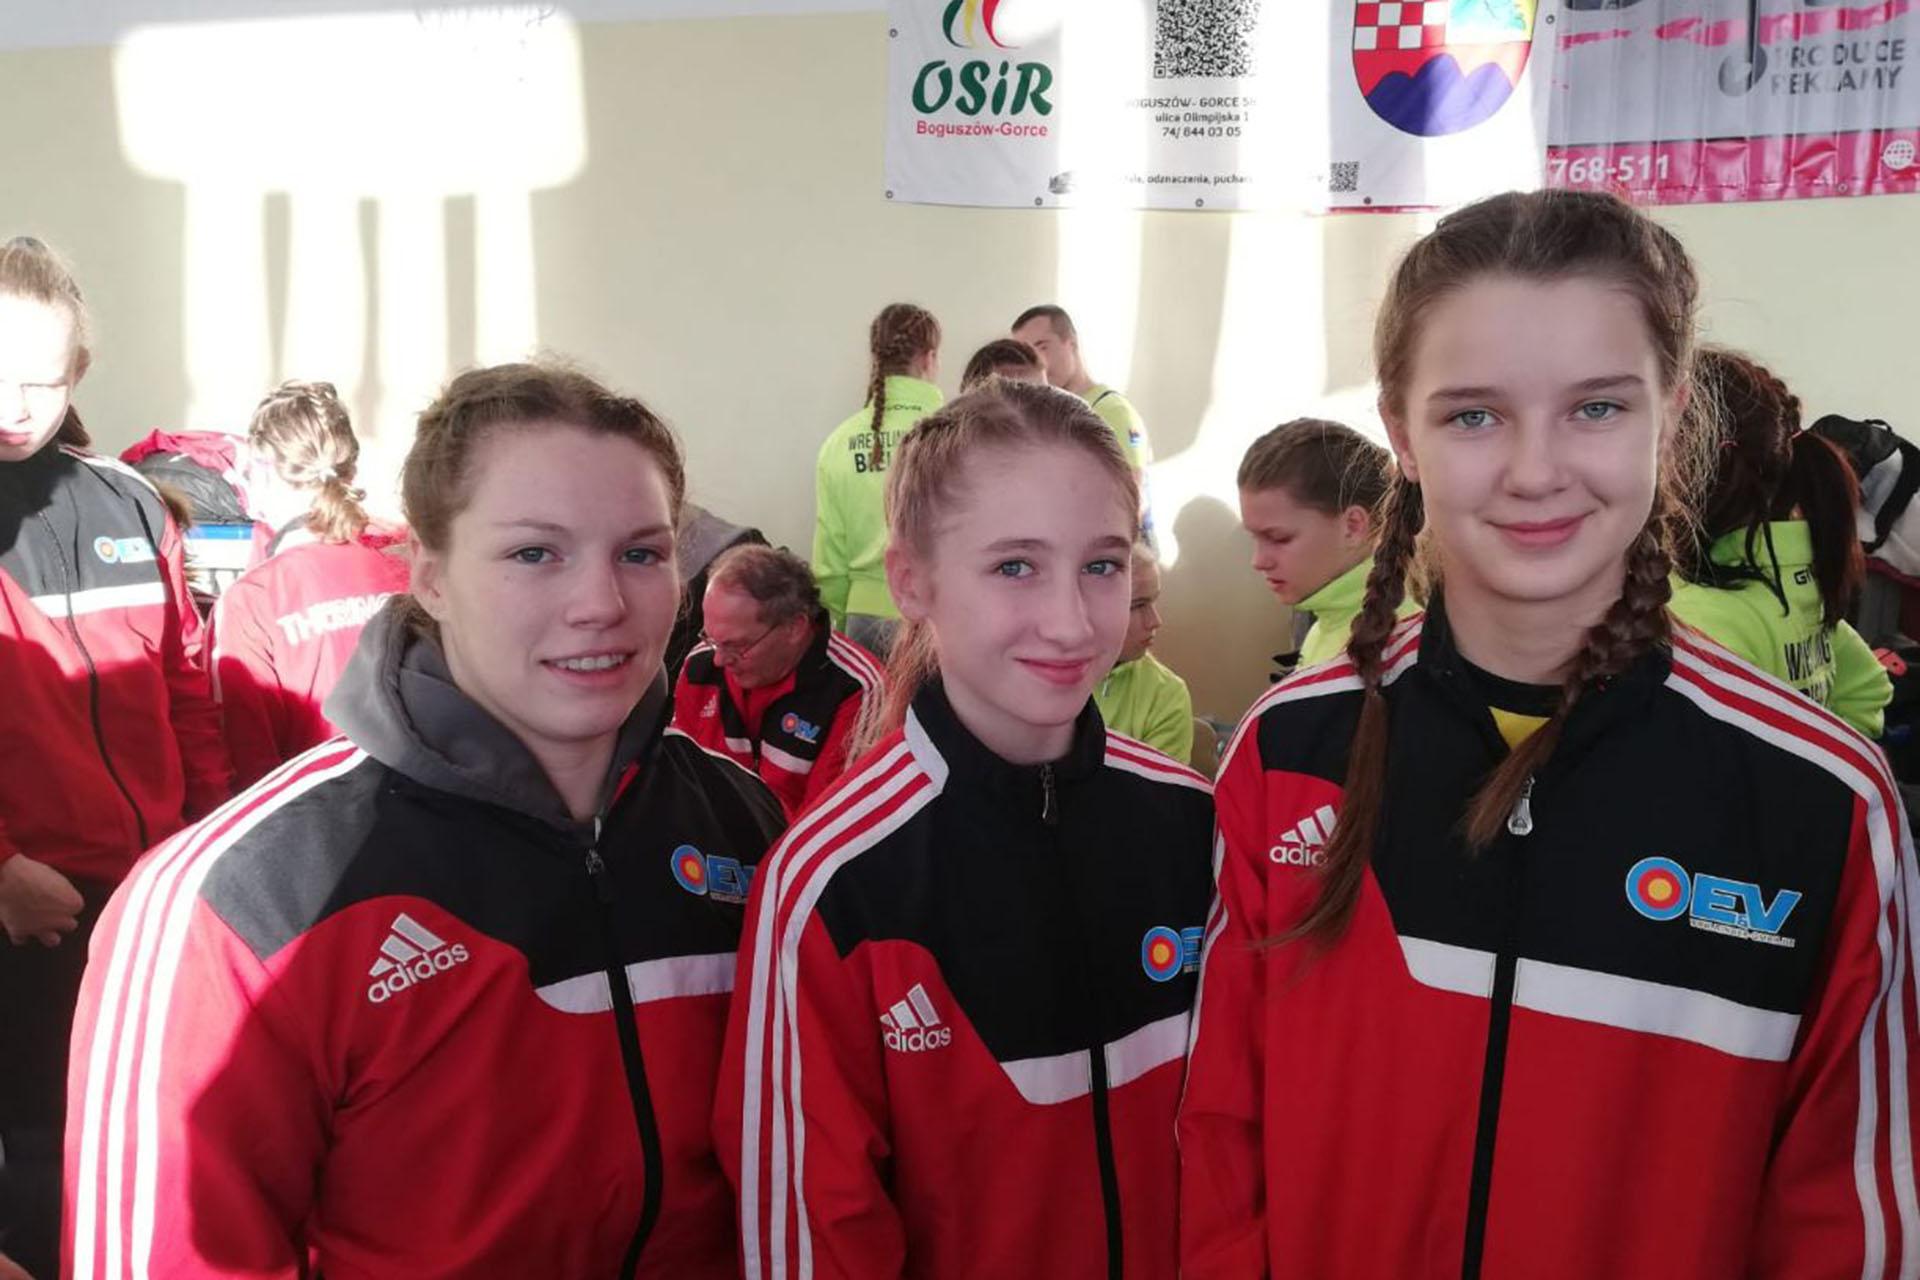 HEROS Lady Open 2019 in Czarny Bór Polen vom 29.11.-01.12.2019